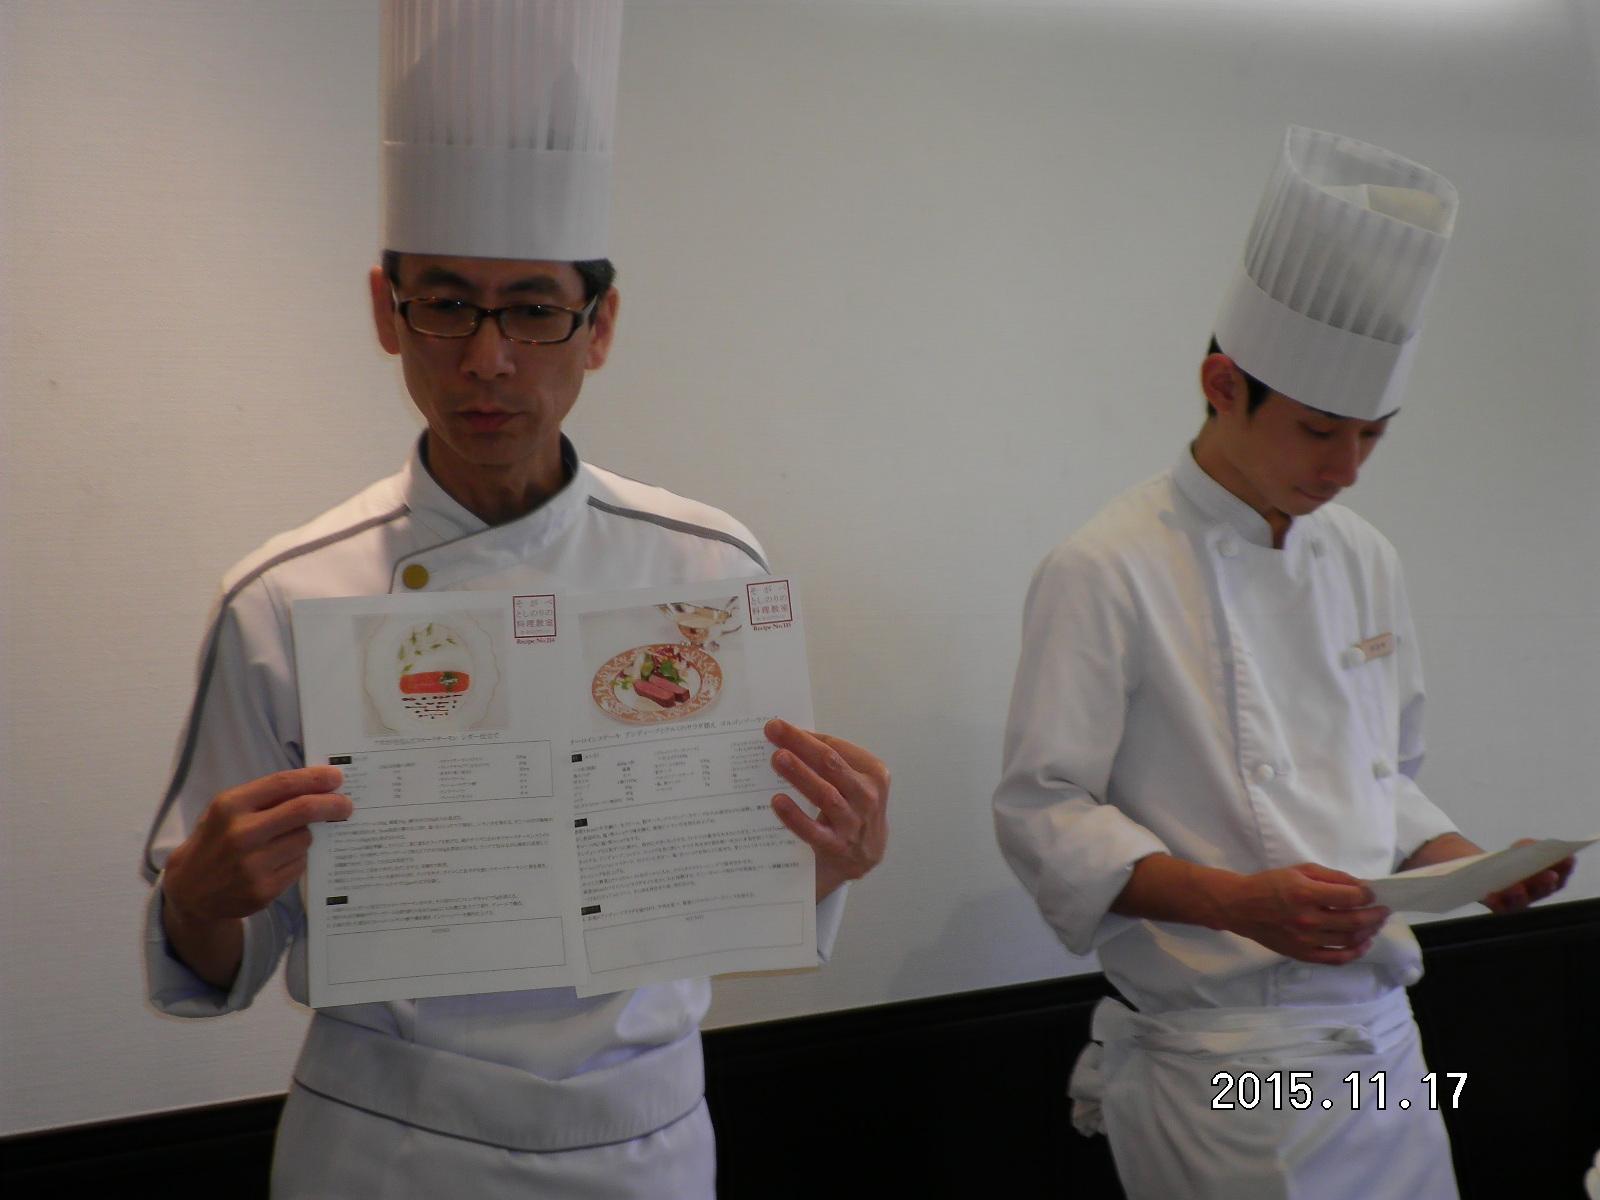 第55回お料理教室_e0190287_17211521.jpg